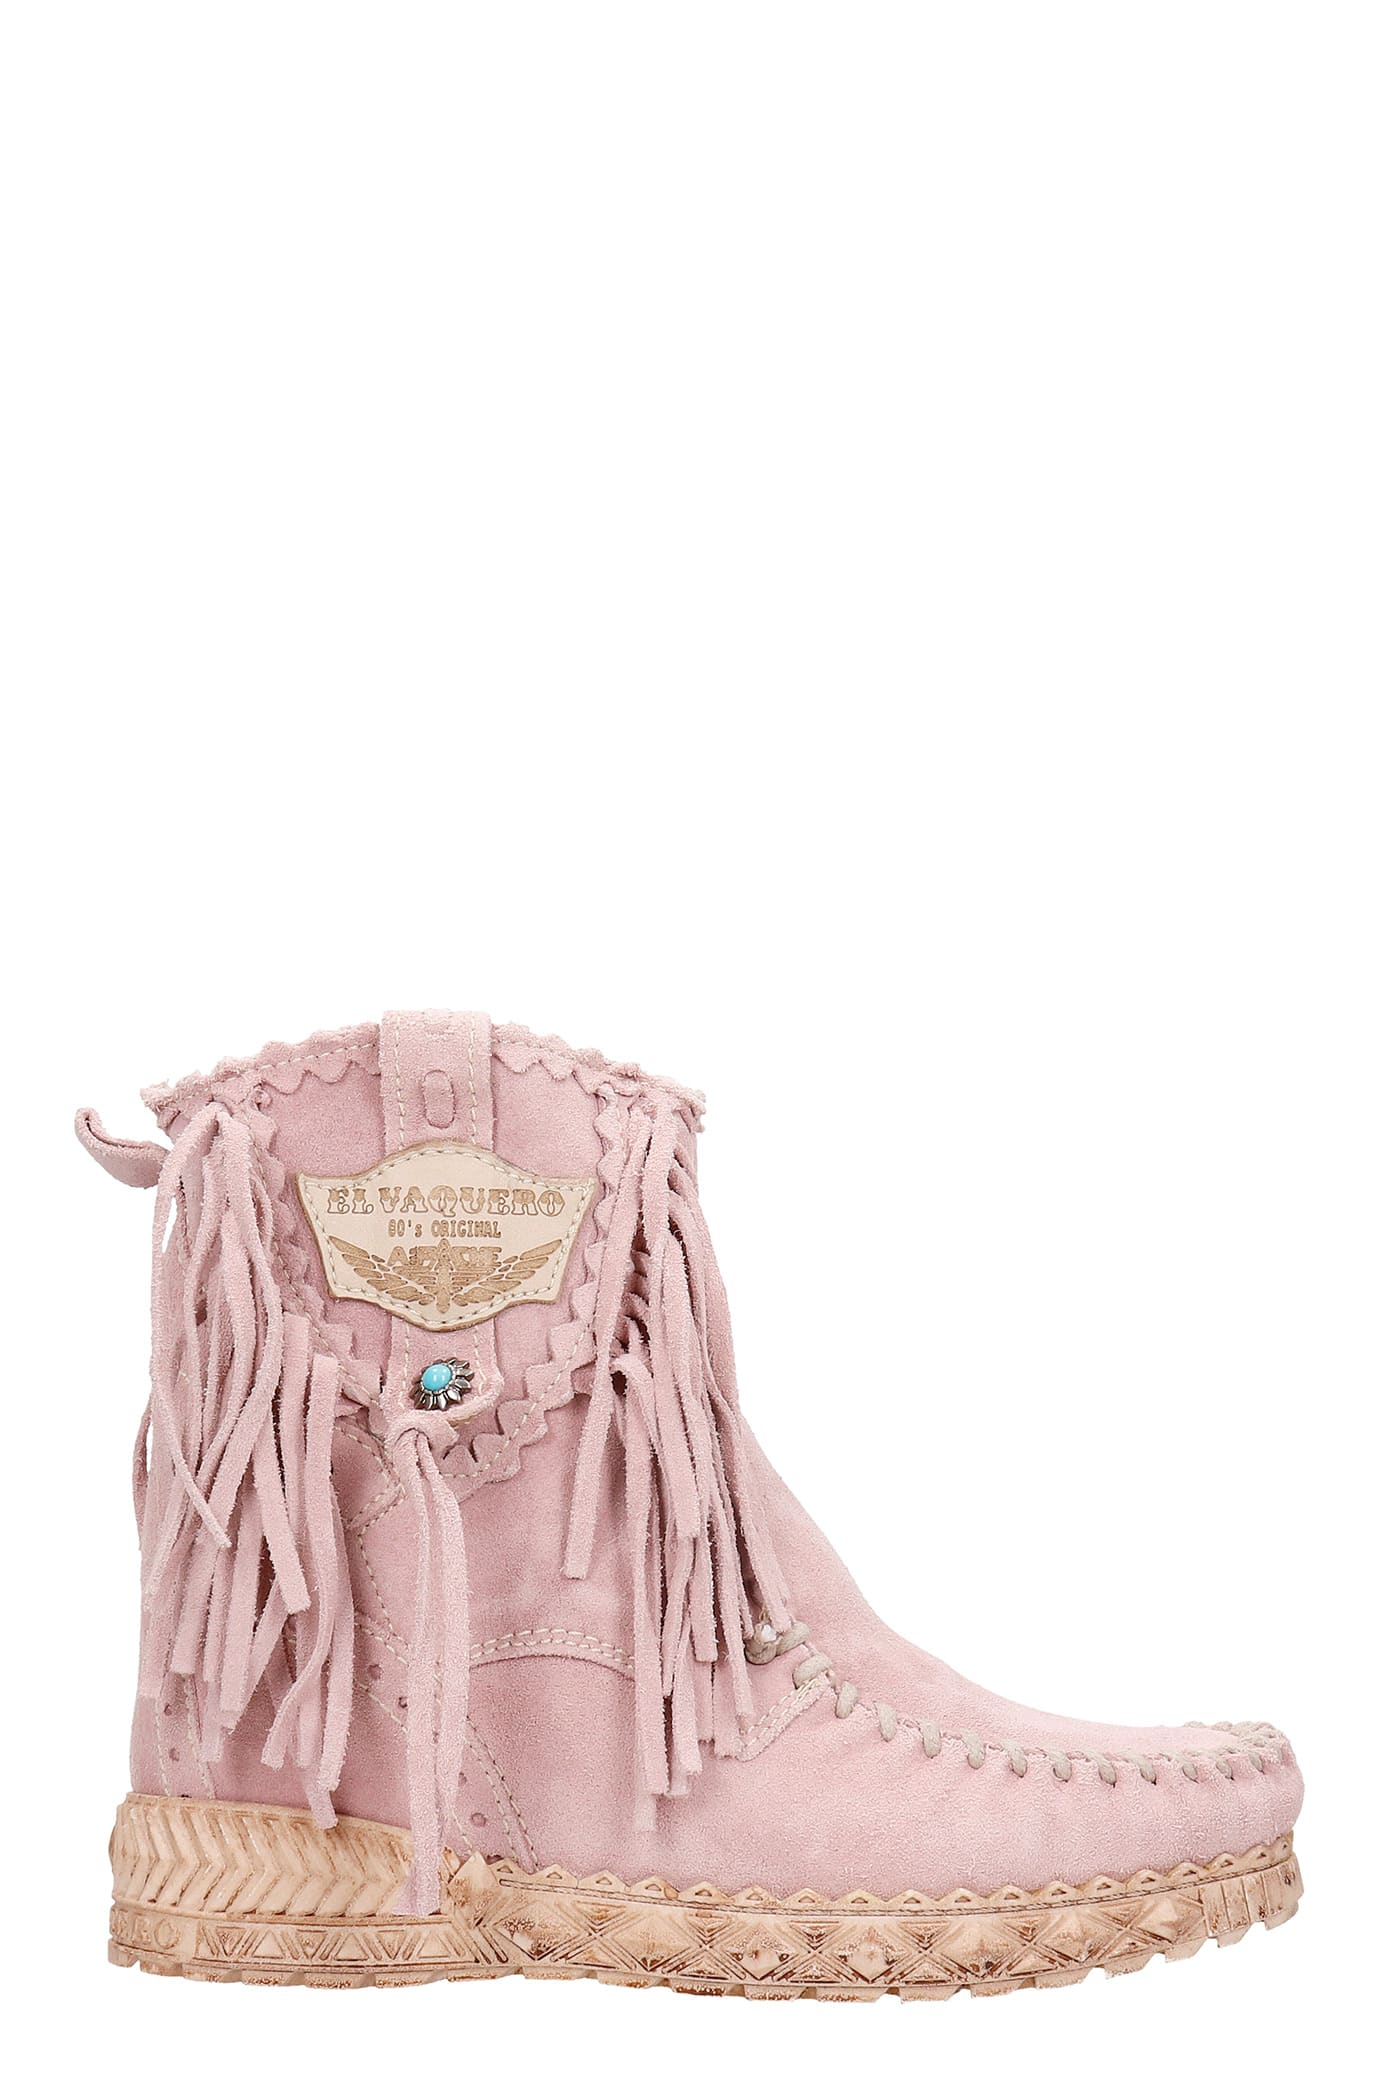 Cloe Ankel Boots Inside Wedge In Rose-pink Suede